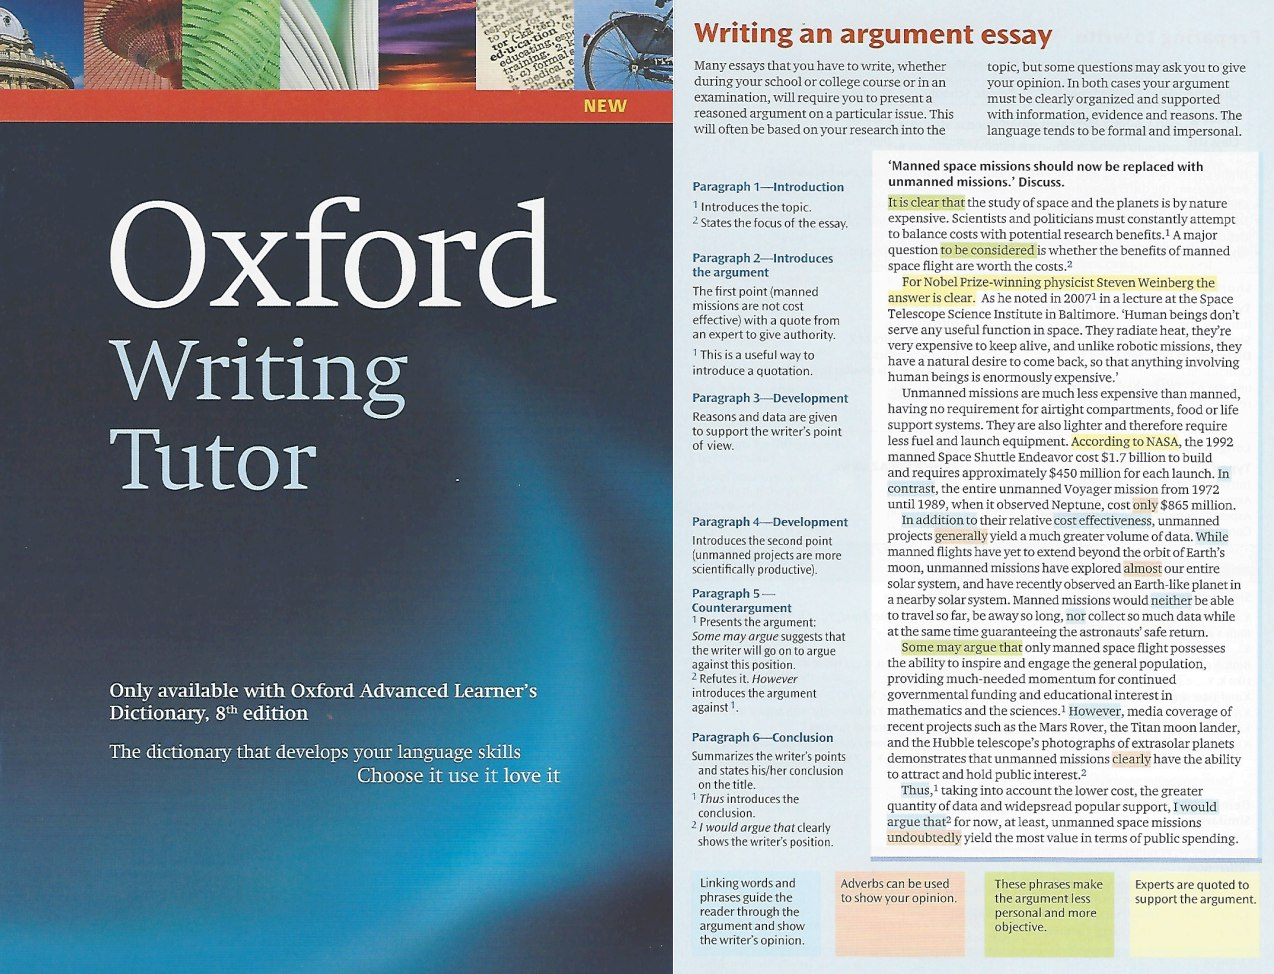 Oxford essay